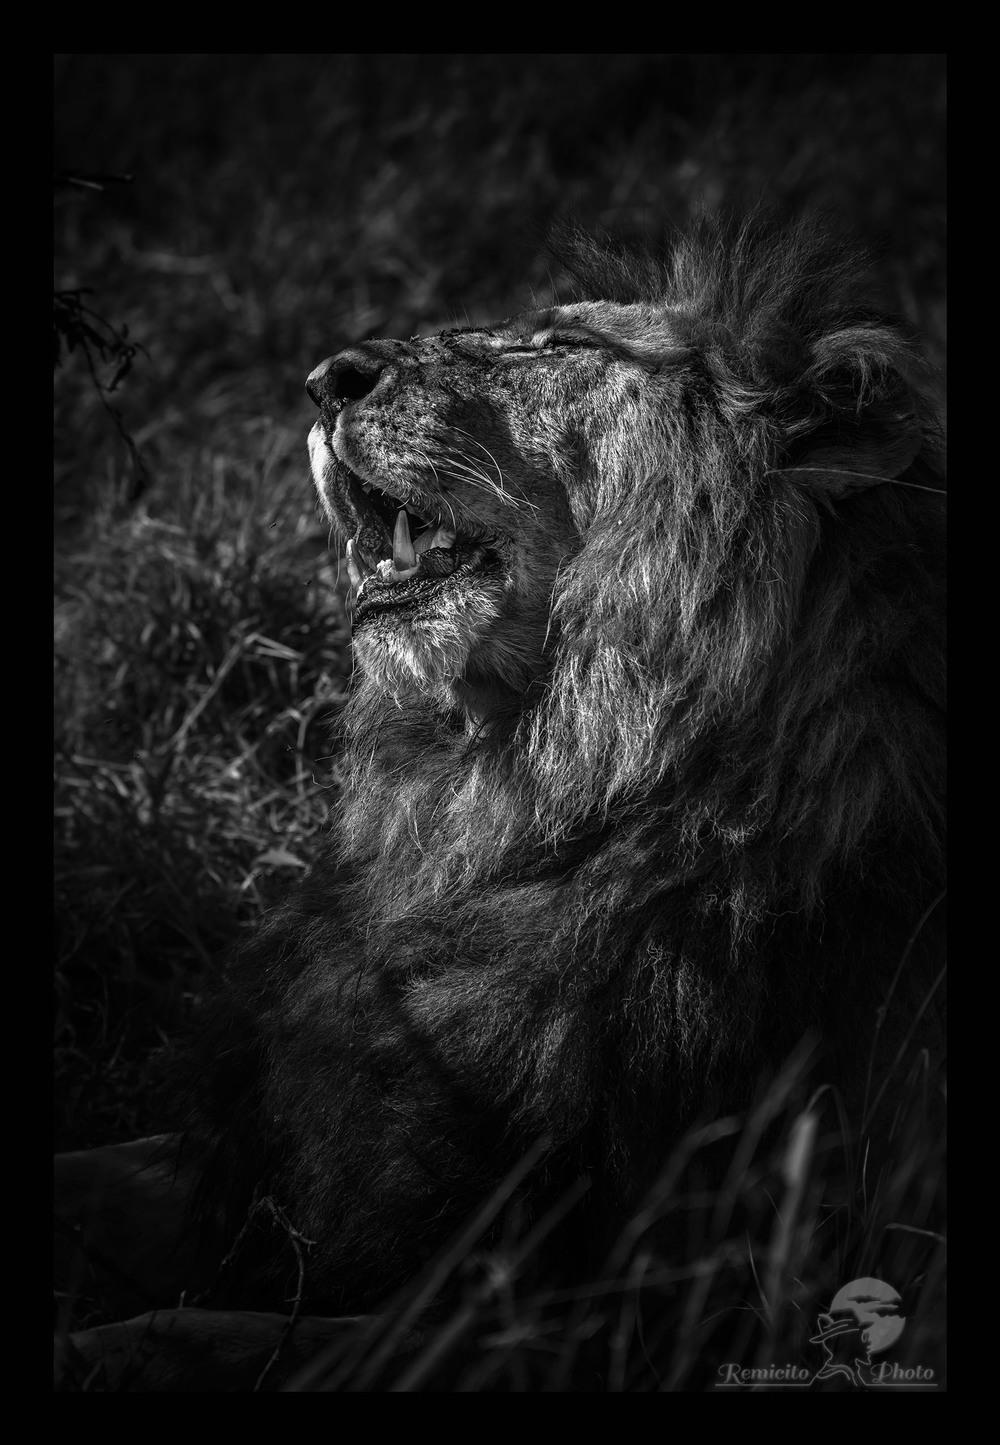 remicito photo 27-07-2016, July 27, 27th July, 27 Juillet, 27 de Julio, photo savane, photo afrique, photo safari afrique, photo safari kenya, photo safari tanzanie, photo afrique noir et blanc, photo noir et blanc kenya, photo noir et blanc tanzanie, photo noir et blanc Masai mara, photo serengeti, photo voyage afrique, photo voyage kenya, photo voyage tanzanie, photo savane afrique, photo savane kenya, Photo savane tanzanie, belle photo afrique, acheter photo afrique, tirage photo afrique, acheter photo kenya, acheter photo tanzanie, tirage photo safari, belle photo savane, offrir photo afrique, acheter photo lion, offrir photo lion, photo noir et blanc paysage,  Lion Africa, hunting Africa, black and white africa, black and white africa photo, kenya photograph, kenya savanna photo, tanzania photograph, kenya savanna photographs, tanzania savanna Photo, best africa shot, best africa photo, best lion shot, best lion photo, best lion photograph, buy photo africa, africa gift photo, lion gift photo, buy lion photo, buy africa Lion photo, black and white photo, black and white photography,  Foto Leon, foto africa regalo, comprar foto africa, offrecer foto africa, africa maravilla, africa linda, foto negro y blanco Leon, foto kenya, foto tanzania, leon africa, leon sabana, leon Kenya, leon Tanzania, offrecer foto negro y blanco,  photo décoration mur, photo décoration chambre, photo décoration toilettes, cadeau décoration, idée cadeau décoration, idée cadeau pour lui, idée cadeau pour elle, idée cadeau photo mariage, idée cadeau photo nouvel appart, idée cadeau photo nouvel appartement, idée cadeau photo nouvelle maison, idée cadeau photo décoration, idée cadeau originale, idée cadeau fête des pères, idée cadeau fête des mères, idée cadeau naissance, idée cadeau anniversaire, idée cadeau anniversaire homme, idée cadeau anniversaire femme, idée cadeau noël, idée cadeau noel, idée cadeau grand-mère, idée cadeau grand-père, idée cadeau grands-parents, idée cadeau parents,